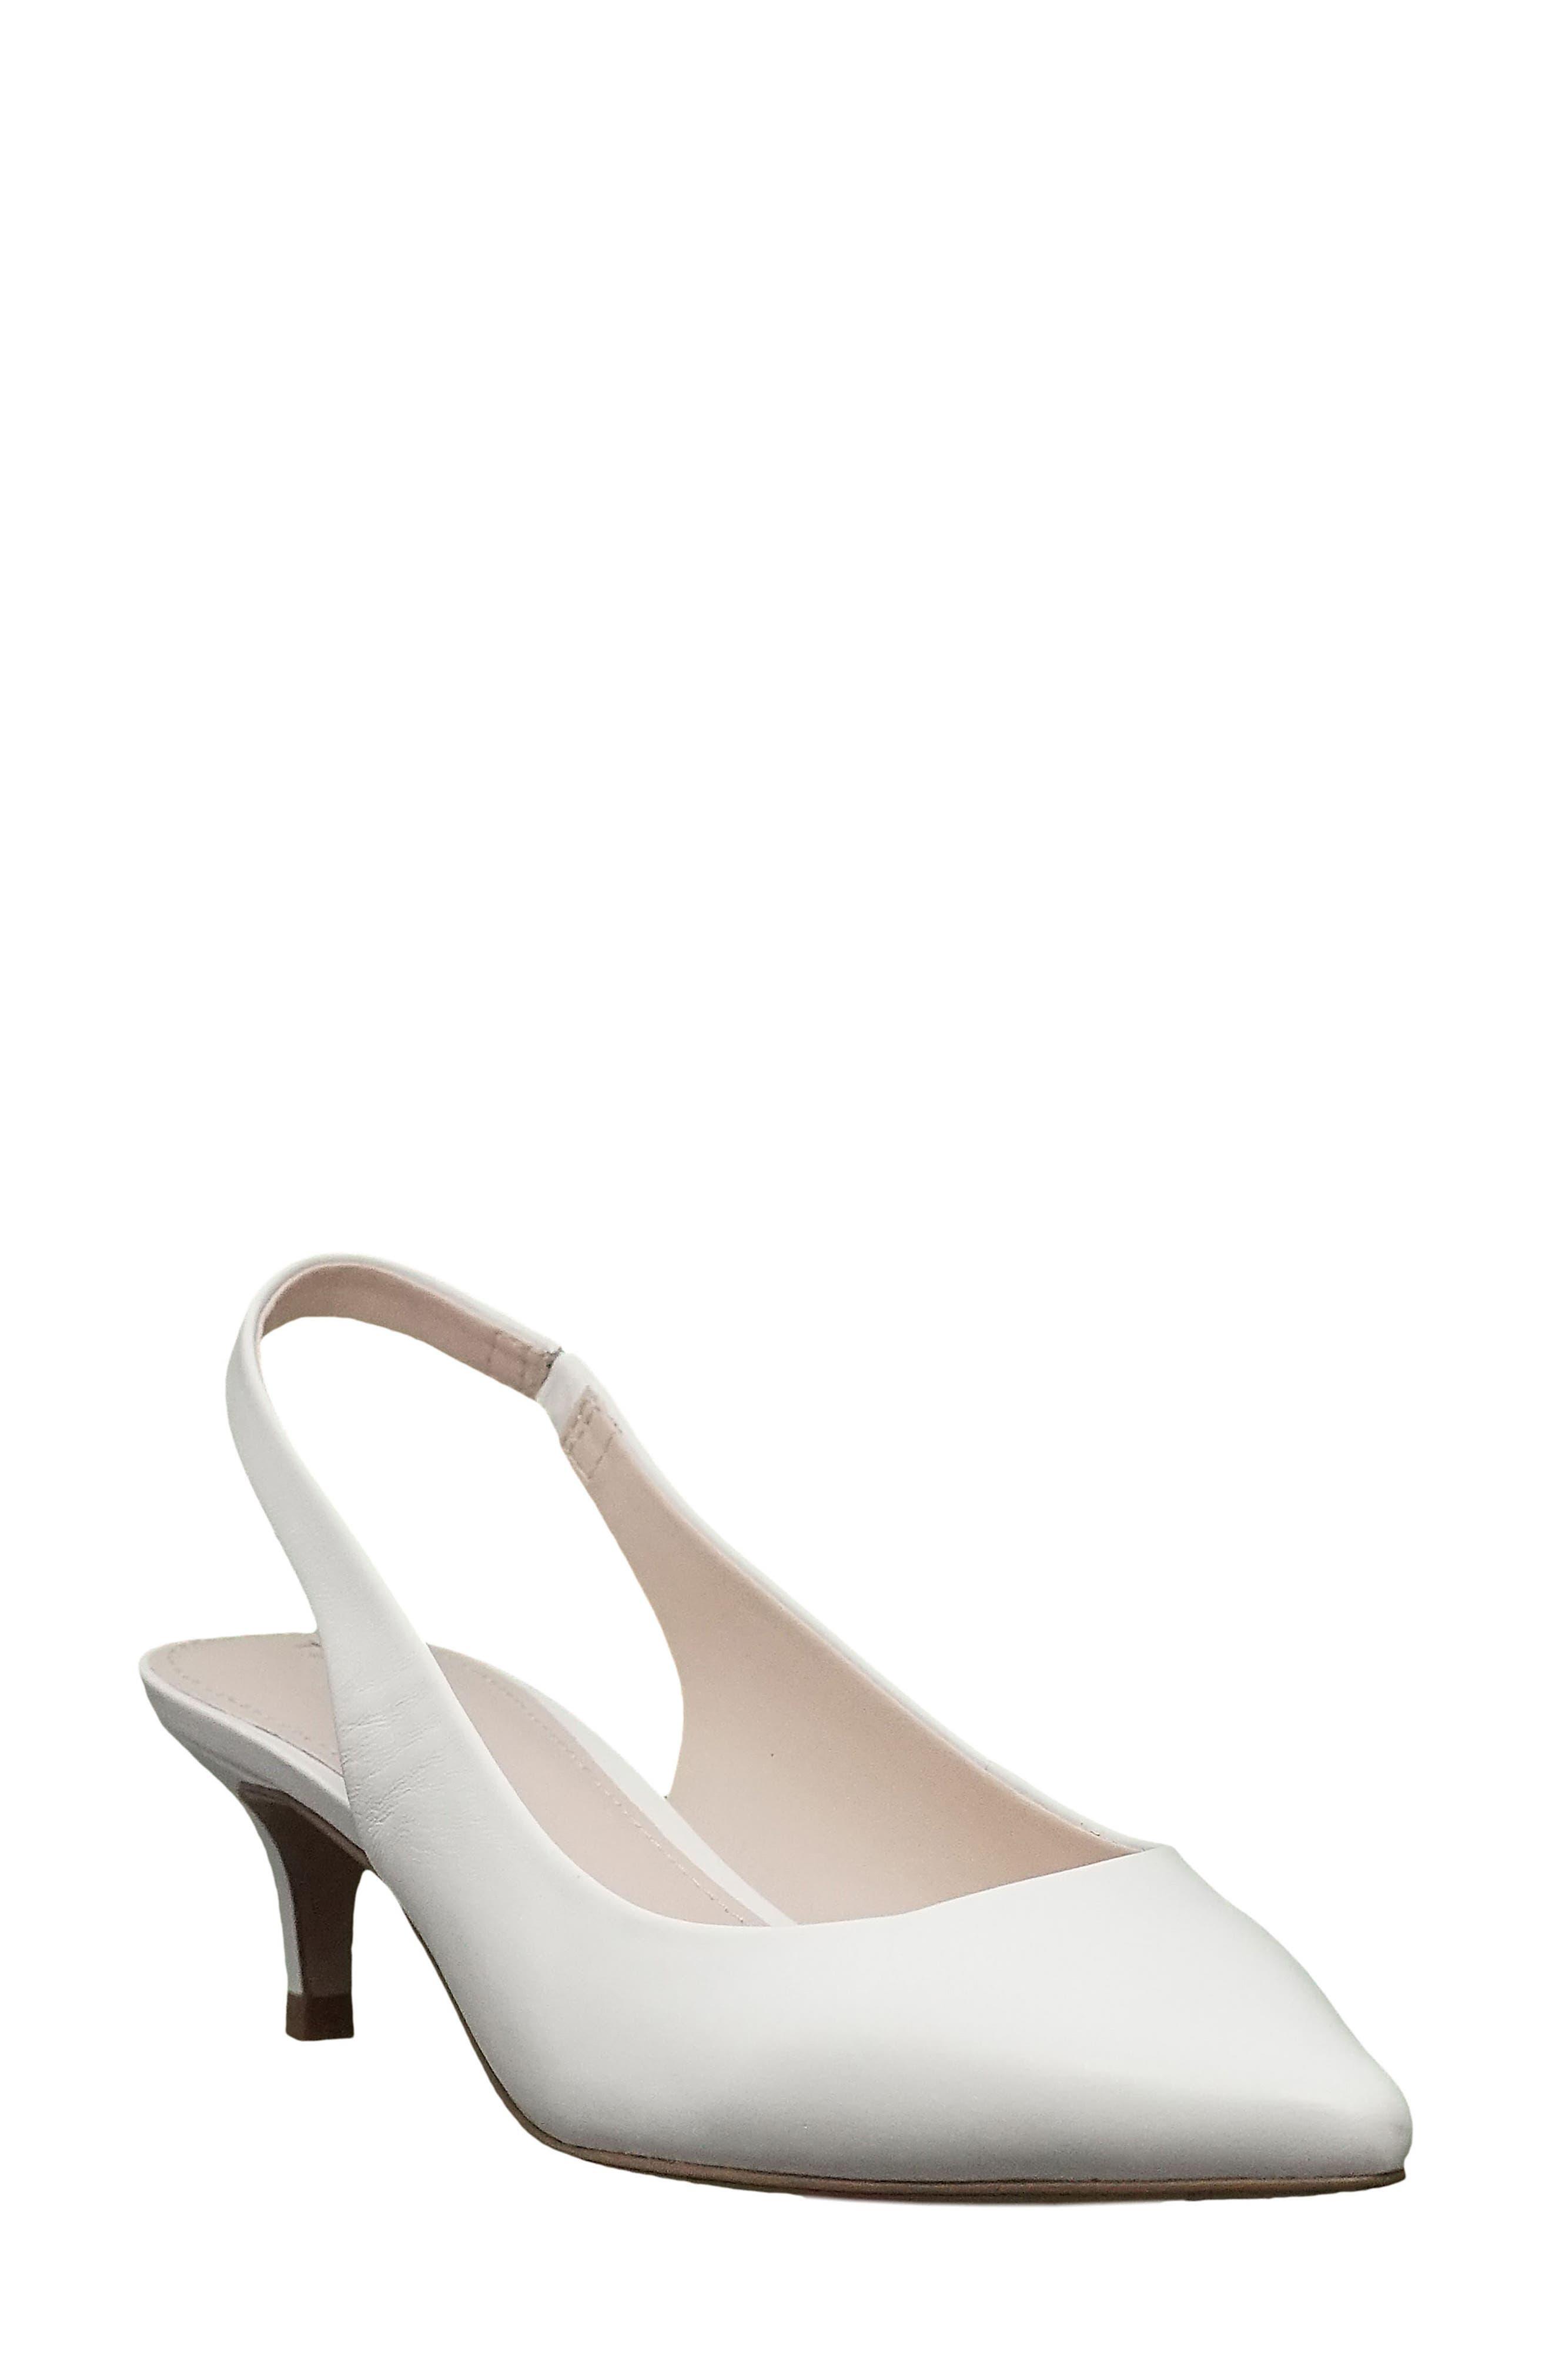 Tahari Finnley Slingback Pump- White